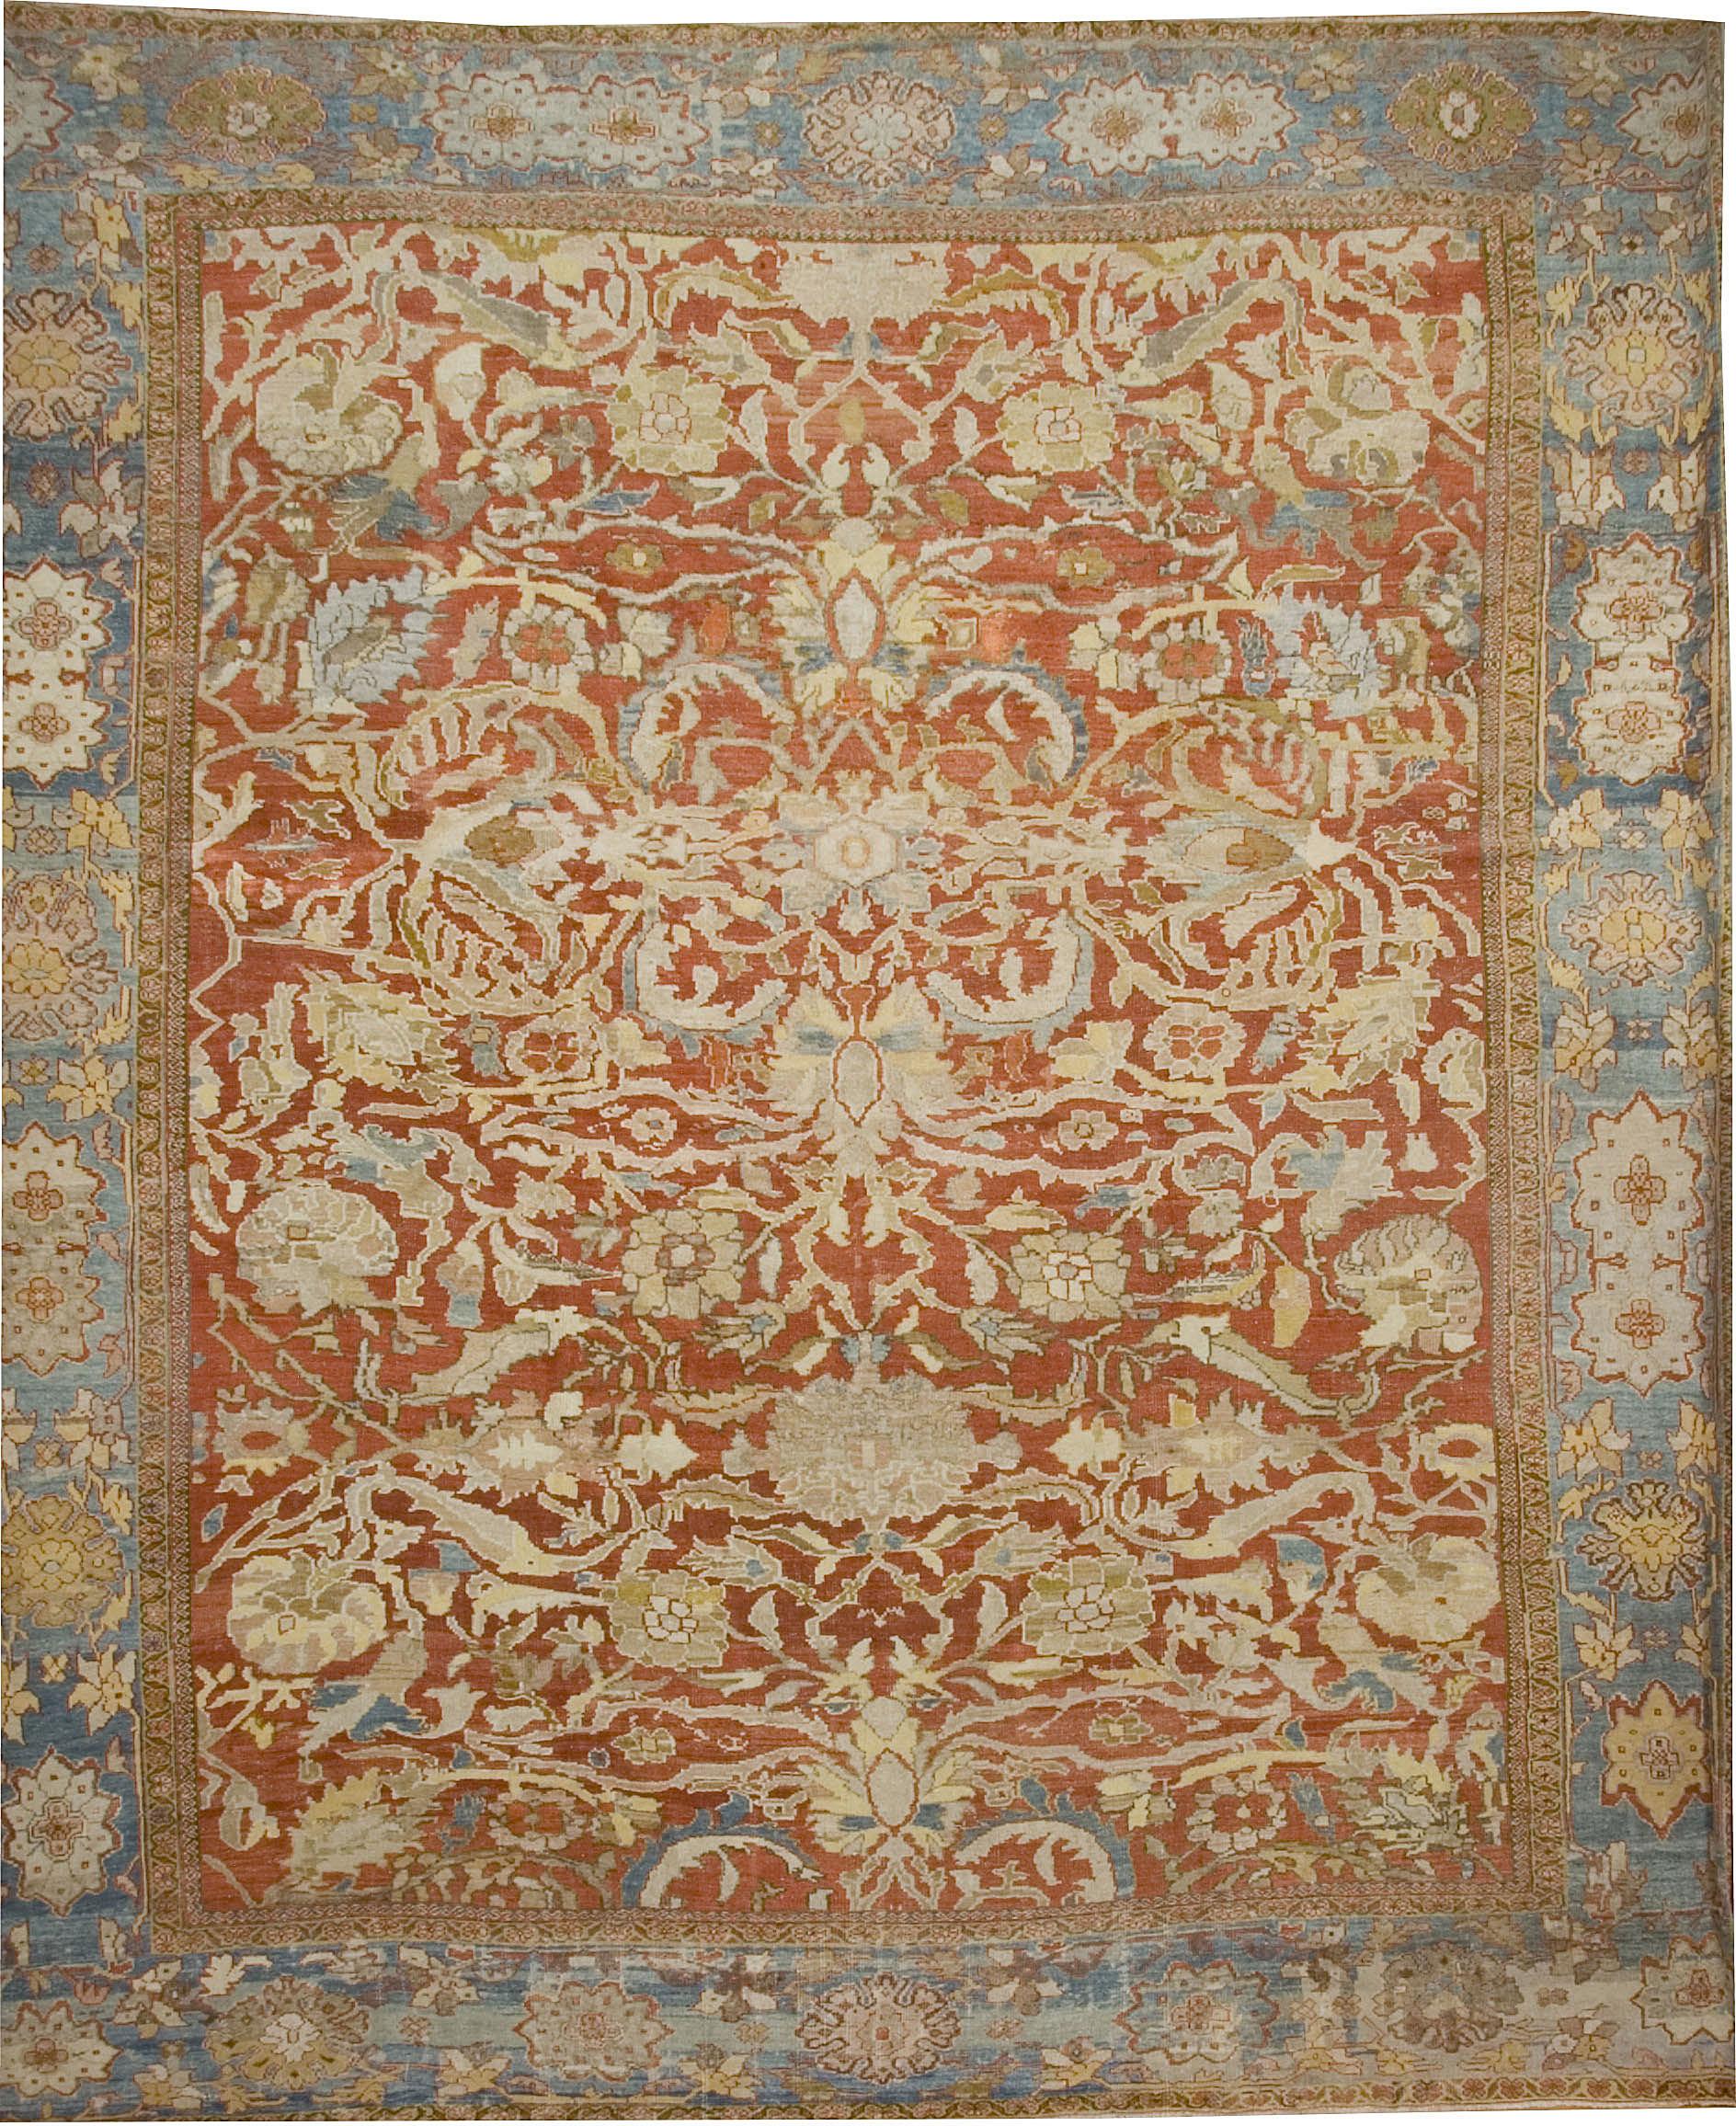 Antique Persian Ziegler Rug